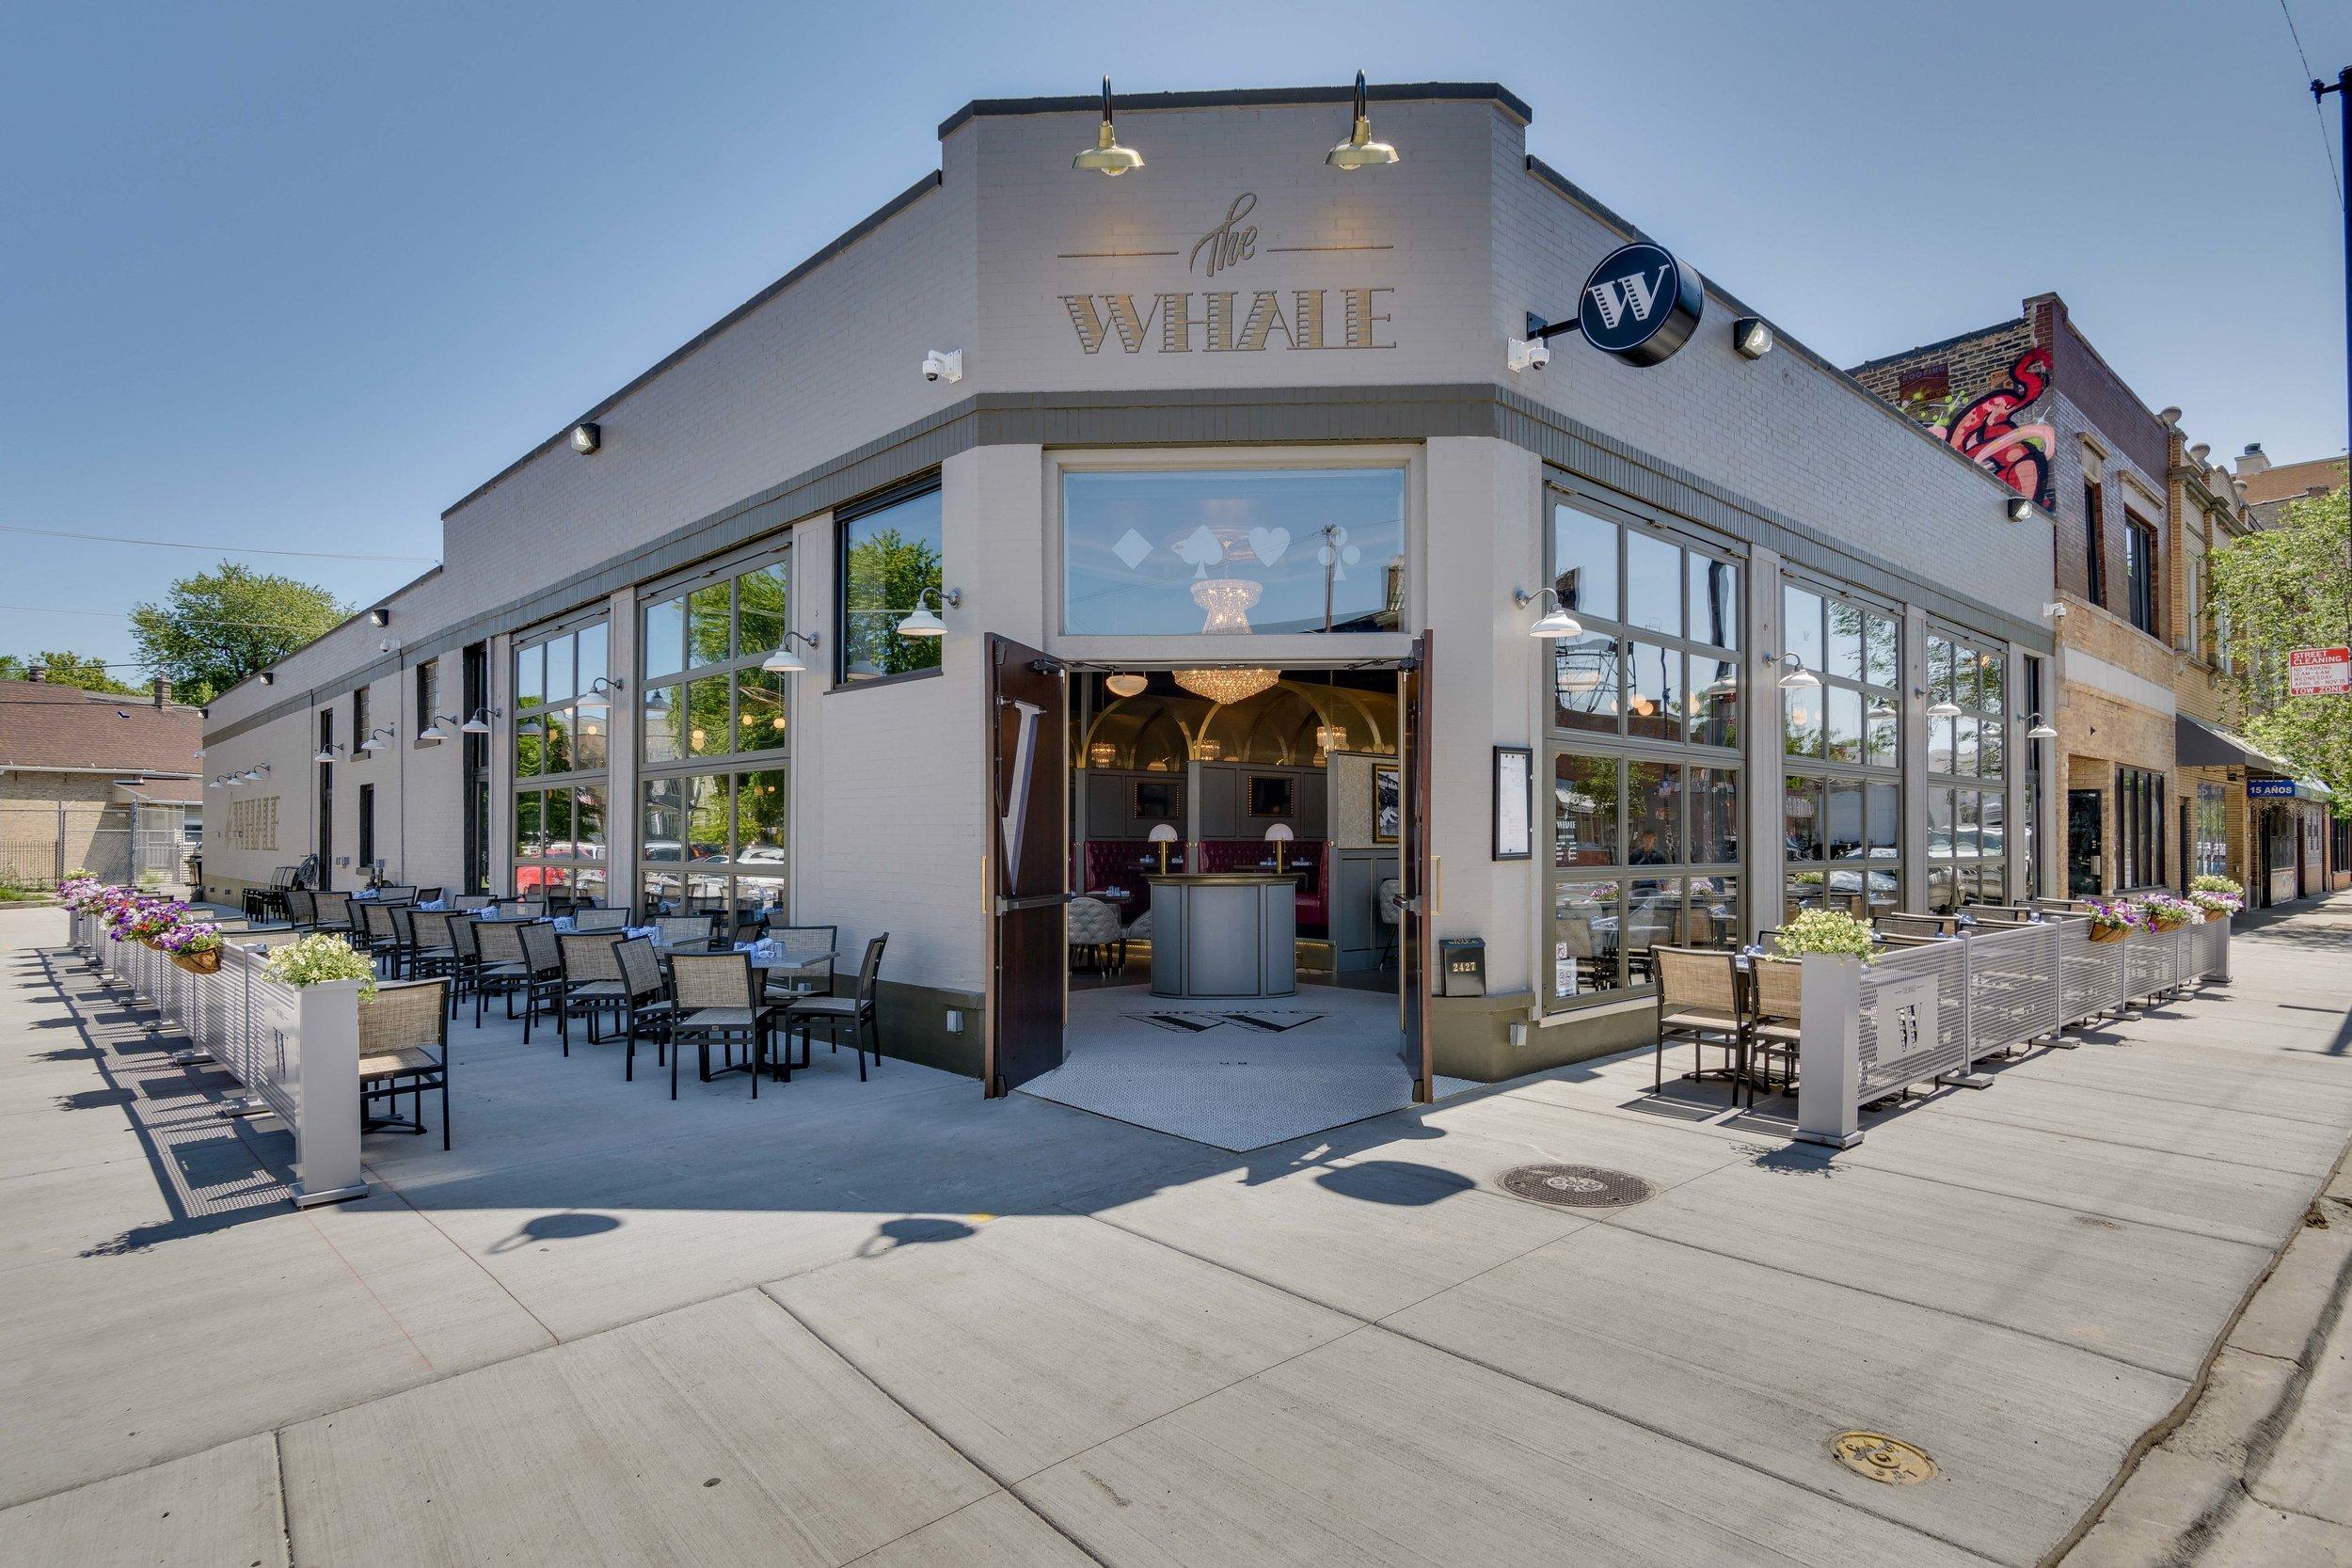 The Whale Restaurant - Web_019.jpg